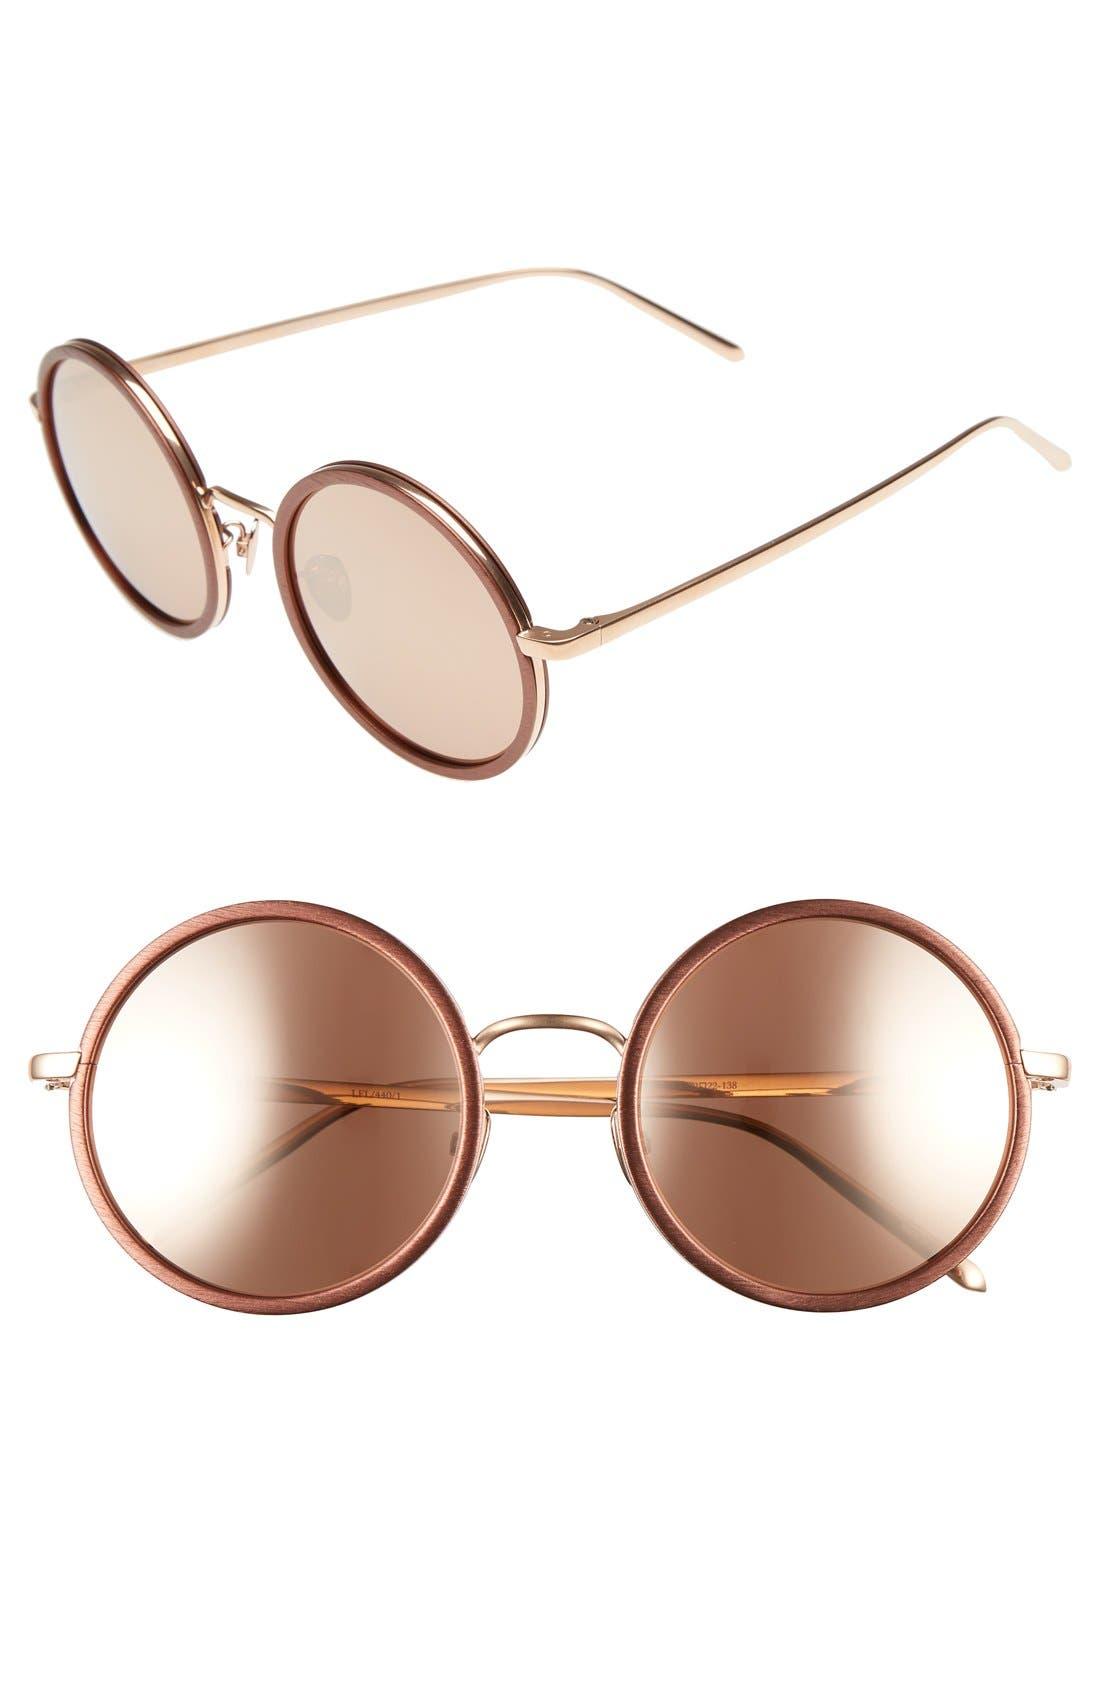 Alternate Image 1 Selected - Linda Farrow 52mm Round 18 Karat Rose Gold Trim Sunglasses